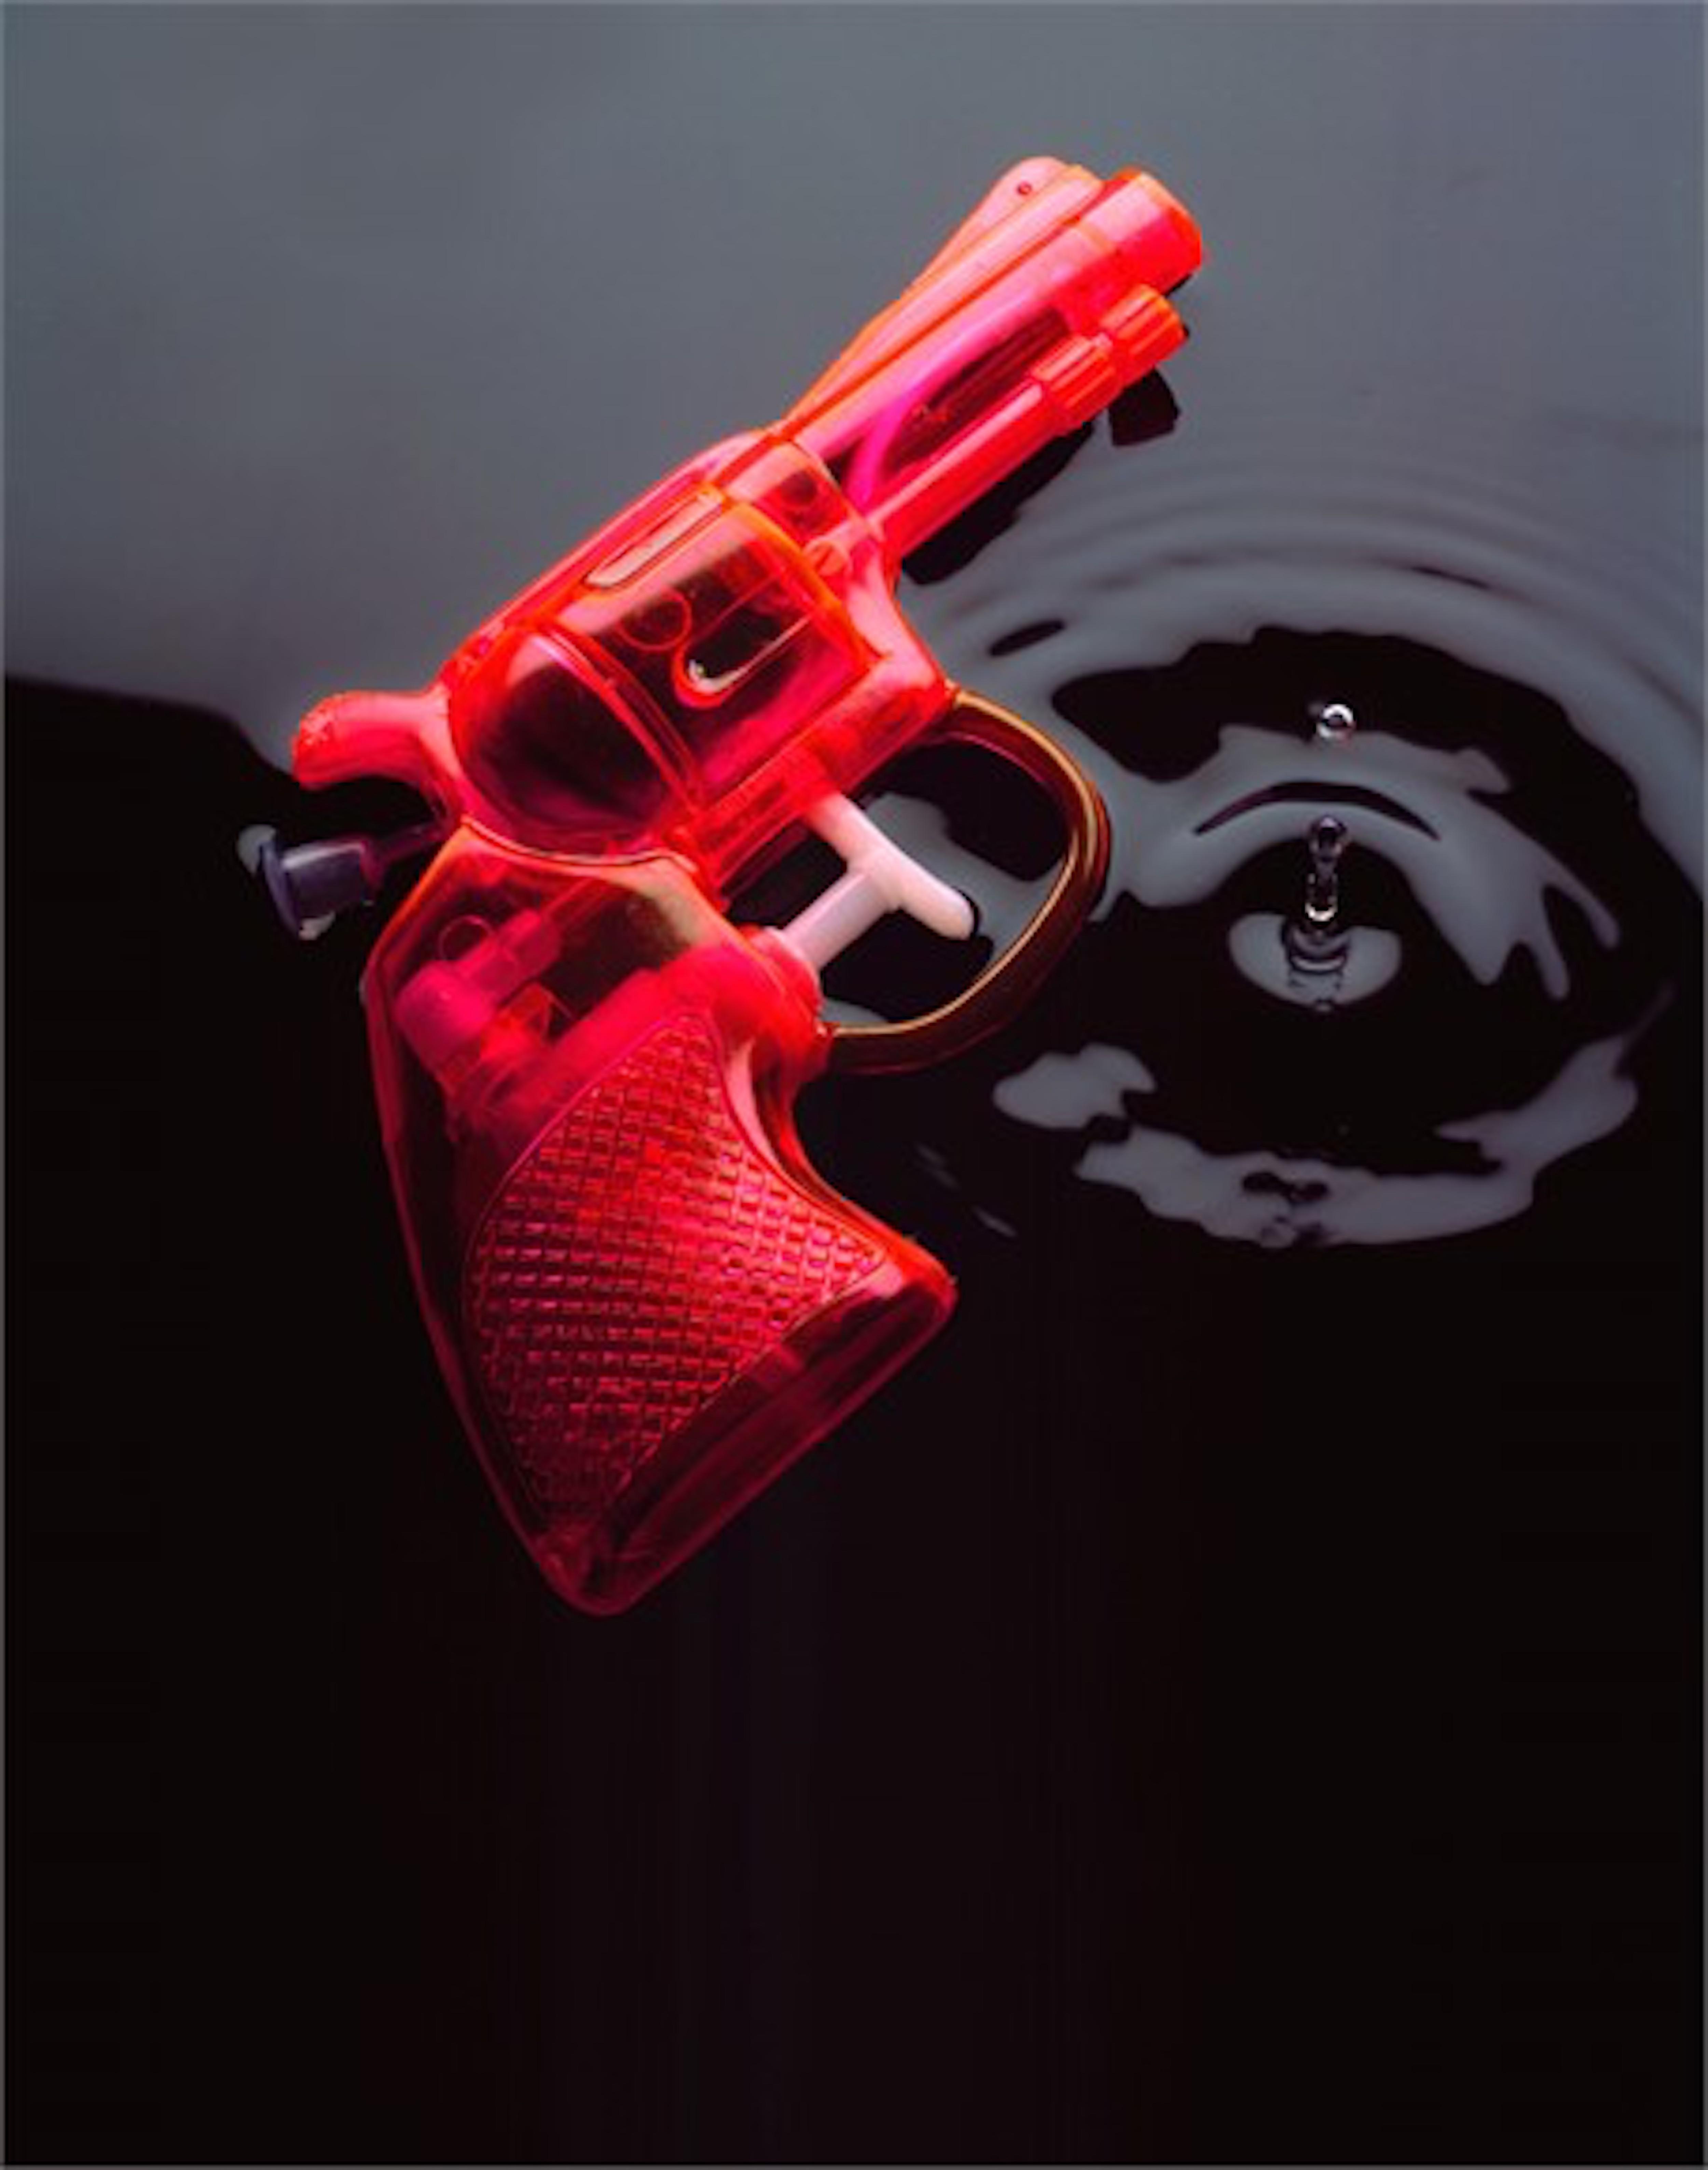 Water Pistol Lt Ed 2/20